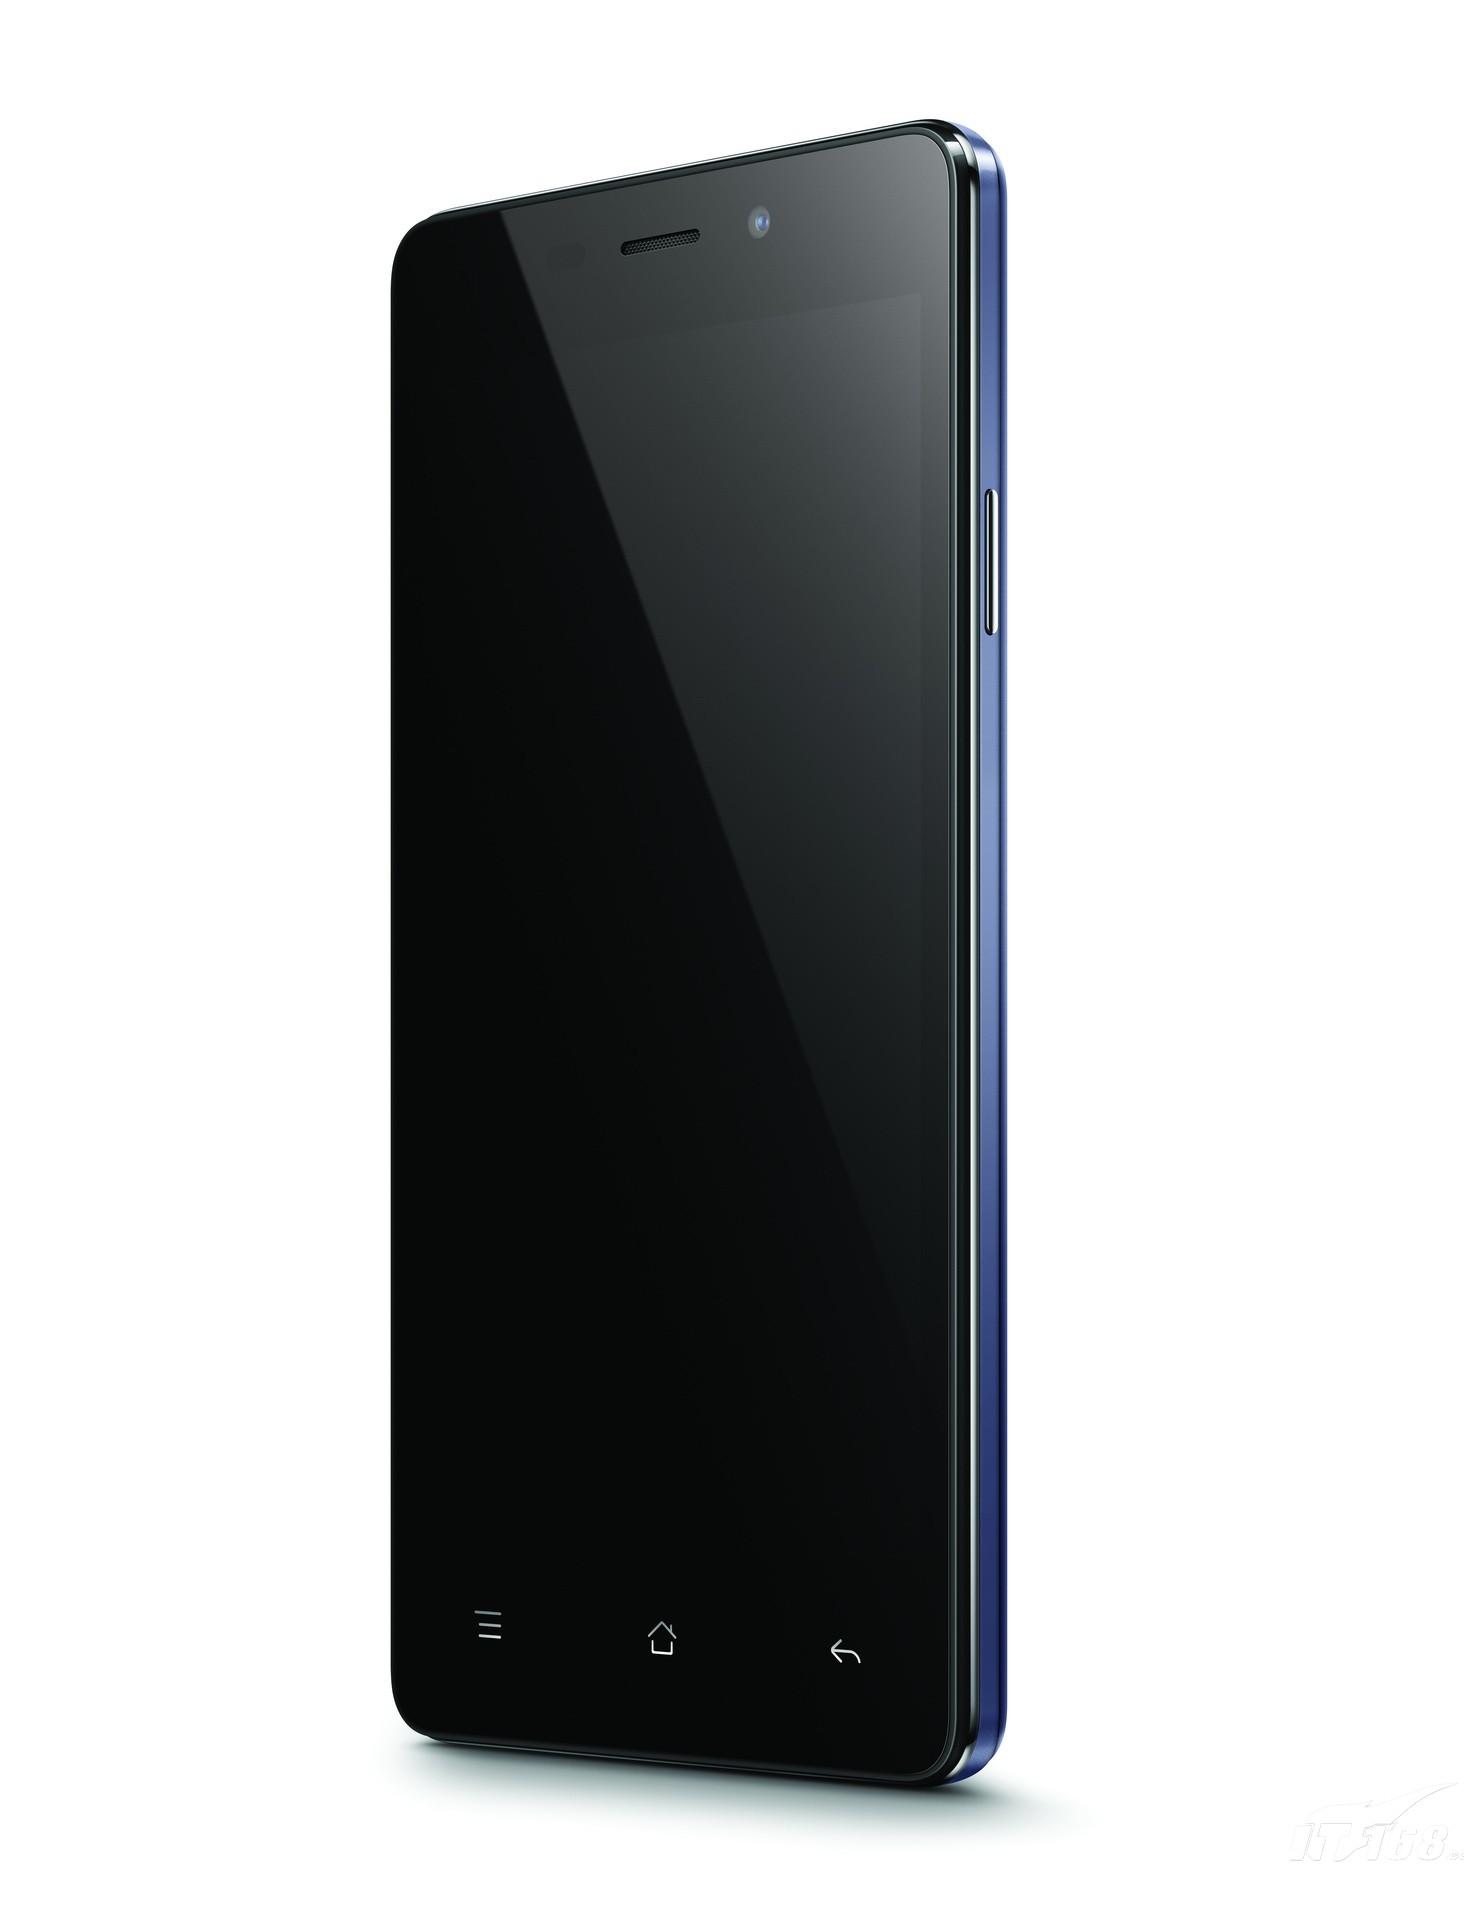 oppoa11 移动4g版 黑色手机产品图片7素材-it168手机